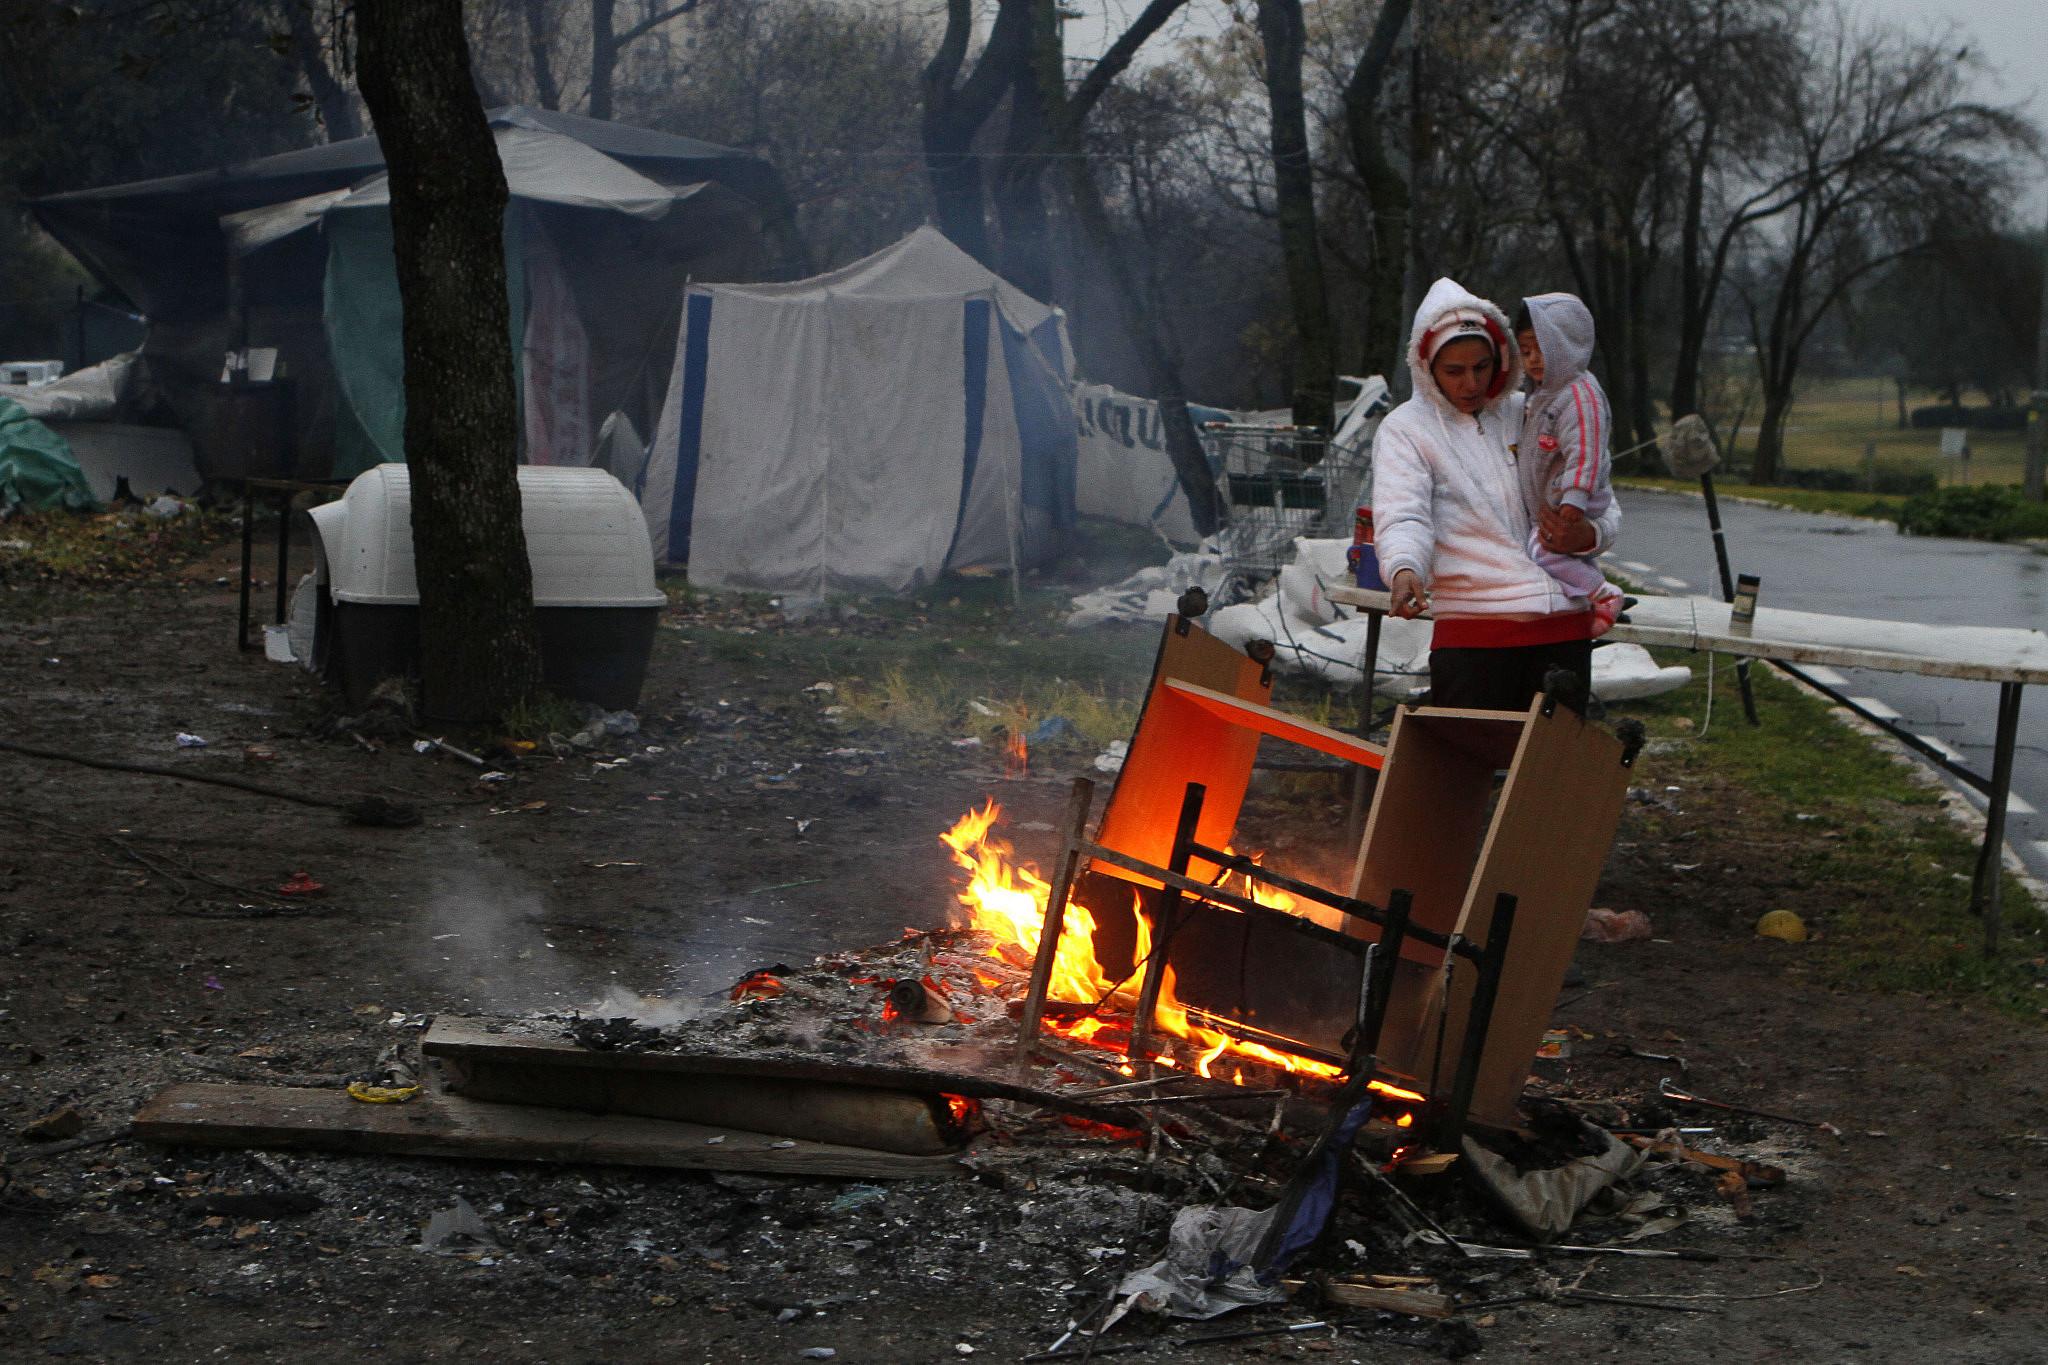 A family outside a homeless camp in Sacher park in Jerusalem on January 23, 2012. (Uri Lenz/Flash90)